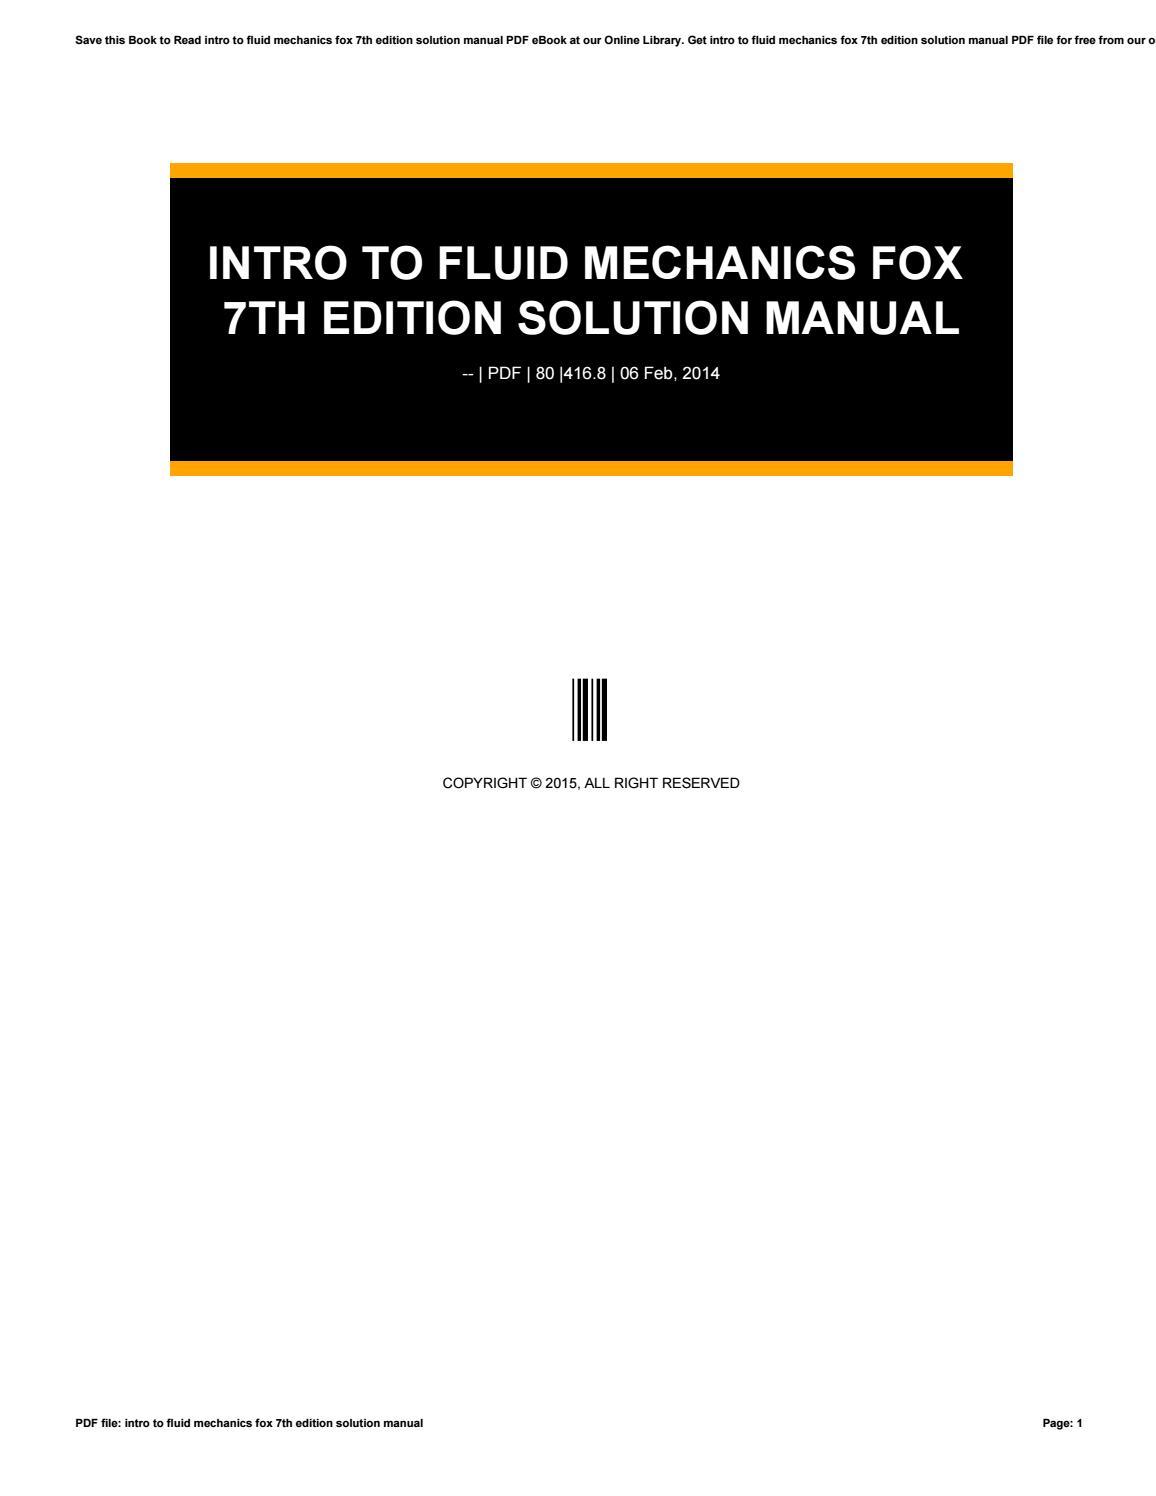 Intro to fluid mechanics fox 7th edition solution manual by caseedu11 -  issuu